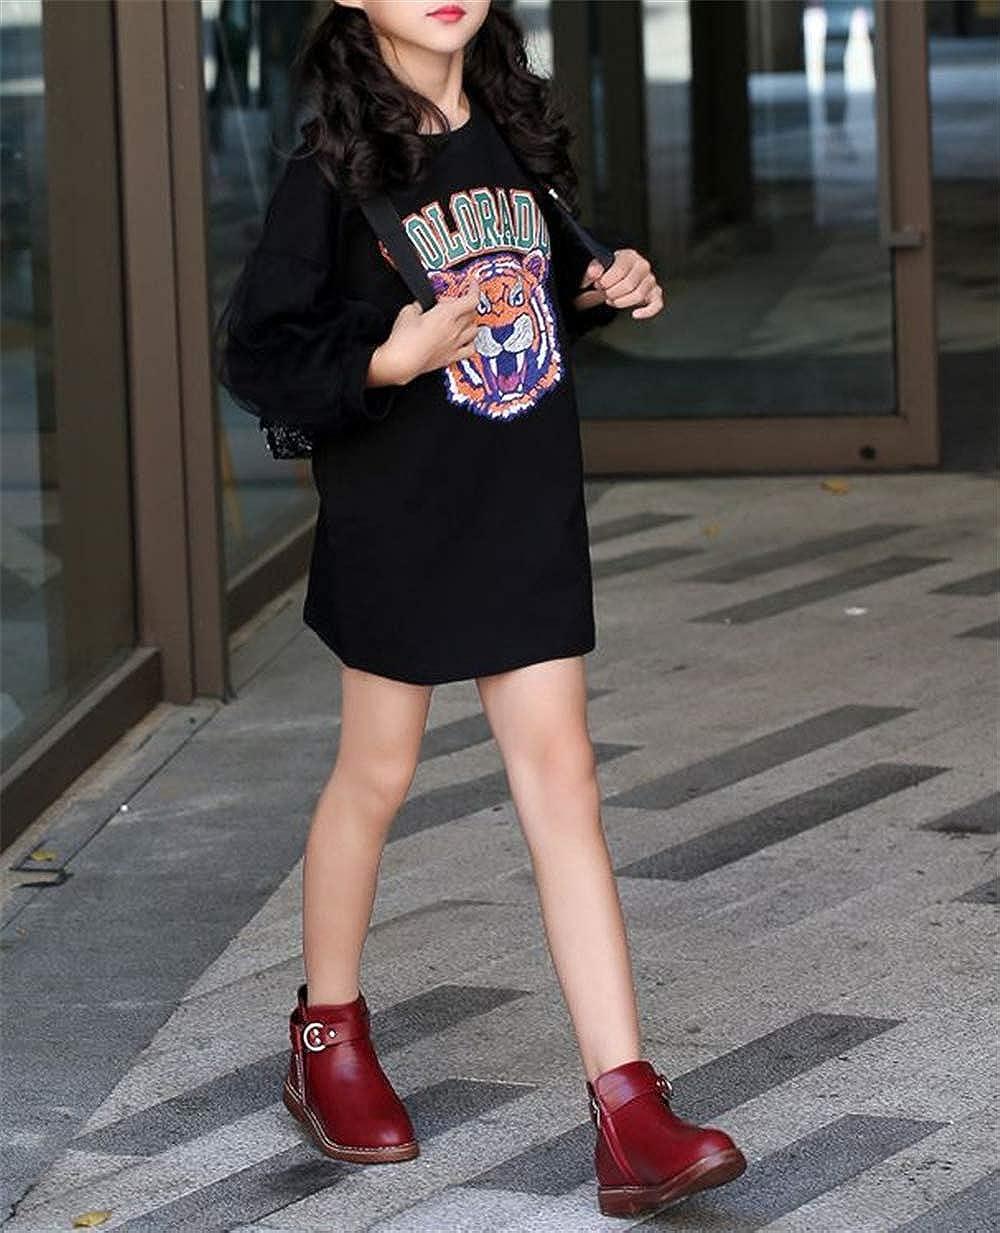 Dress Boot Little//Big Kids Fancyww Baby Girls Ankle Bootie Buckle